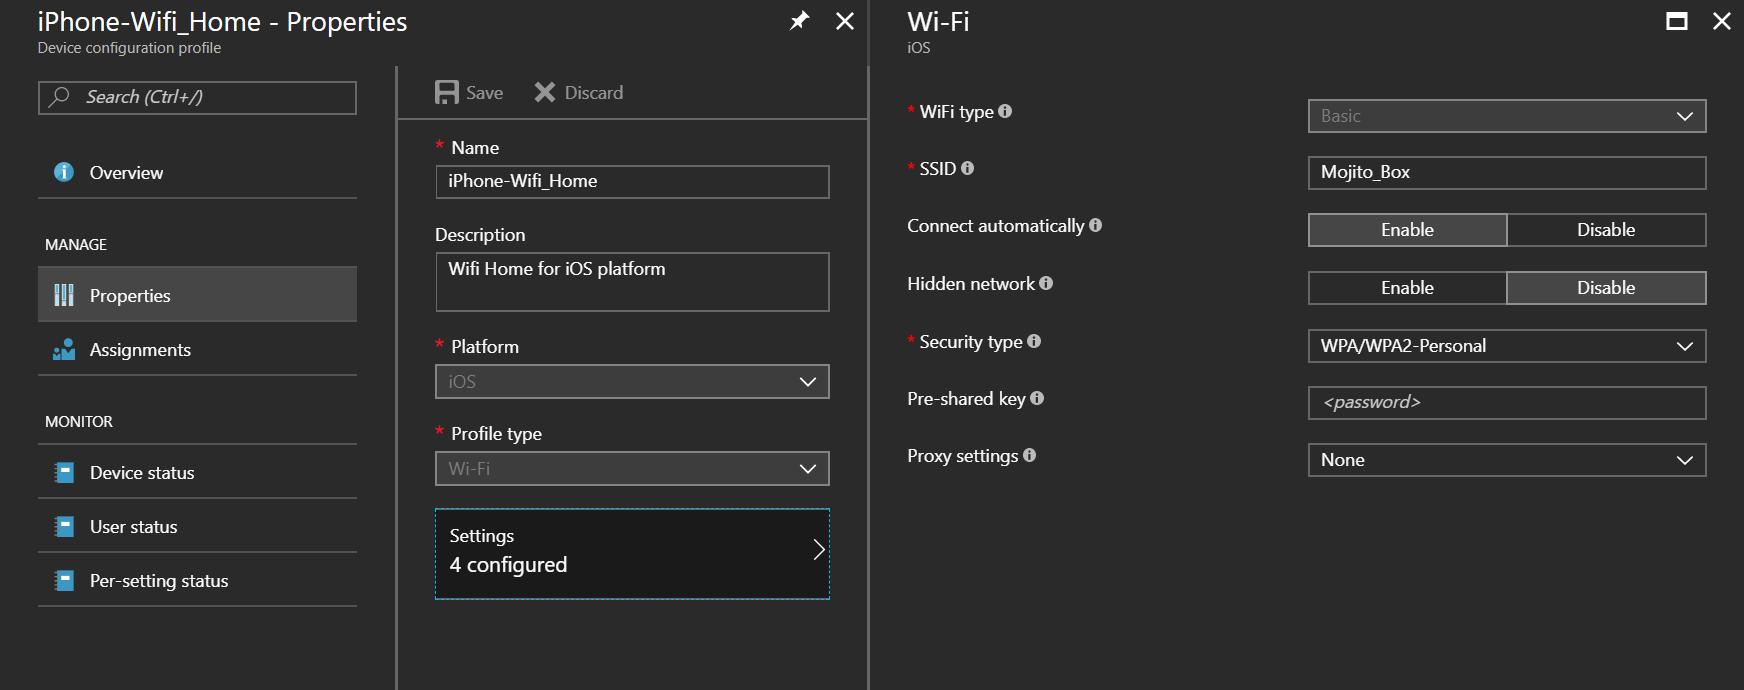 Device configuration tab